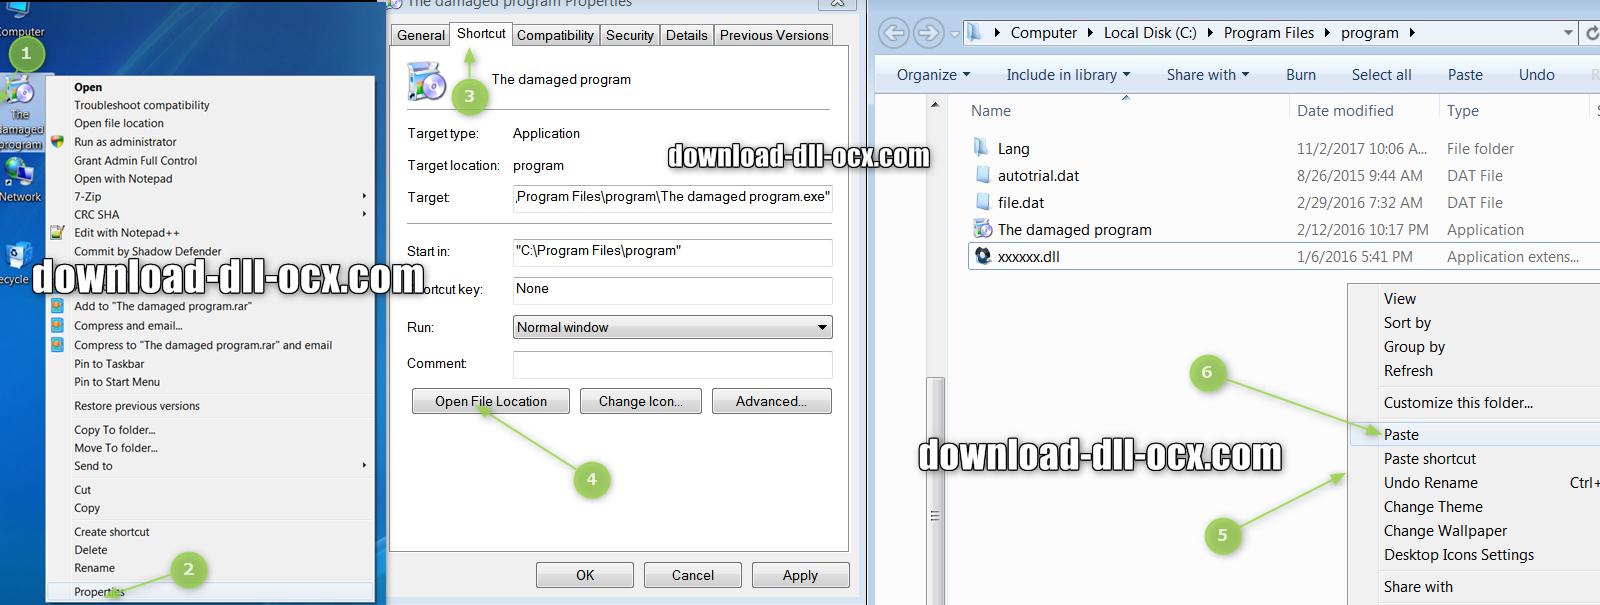 how to install GameuxInstallHelper.dll file? for fix missing